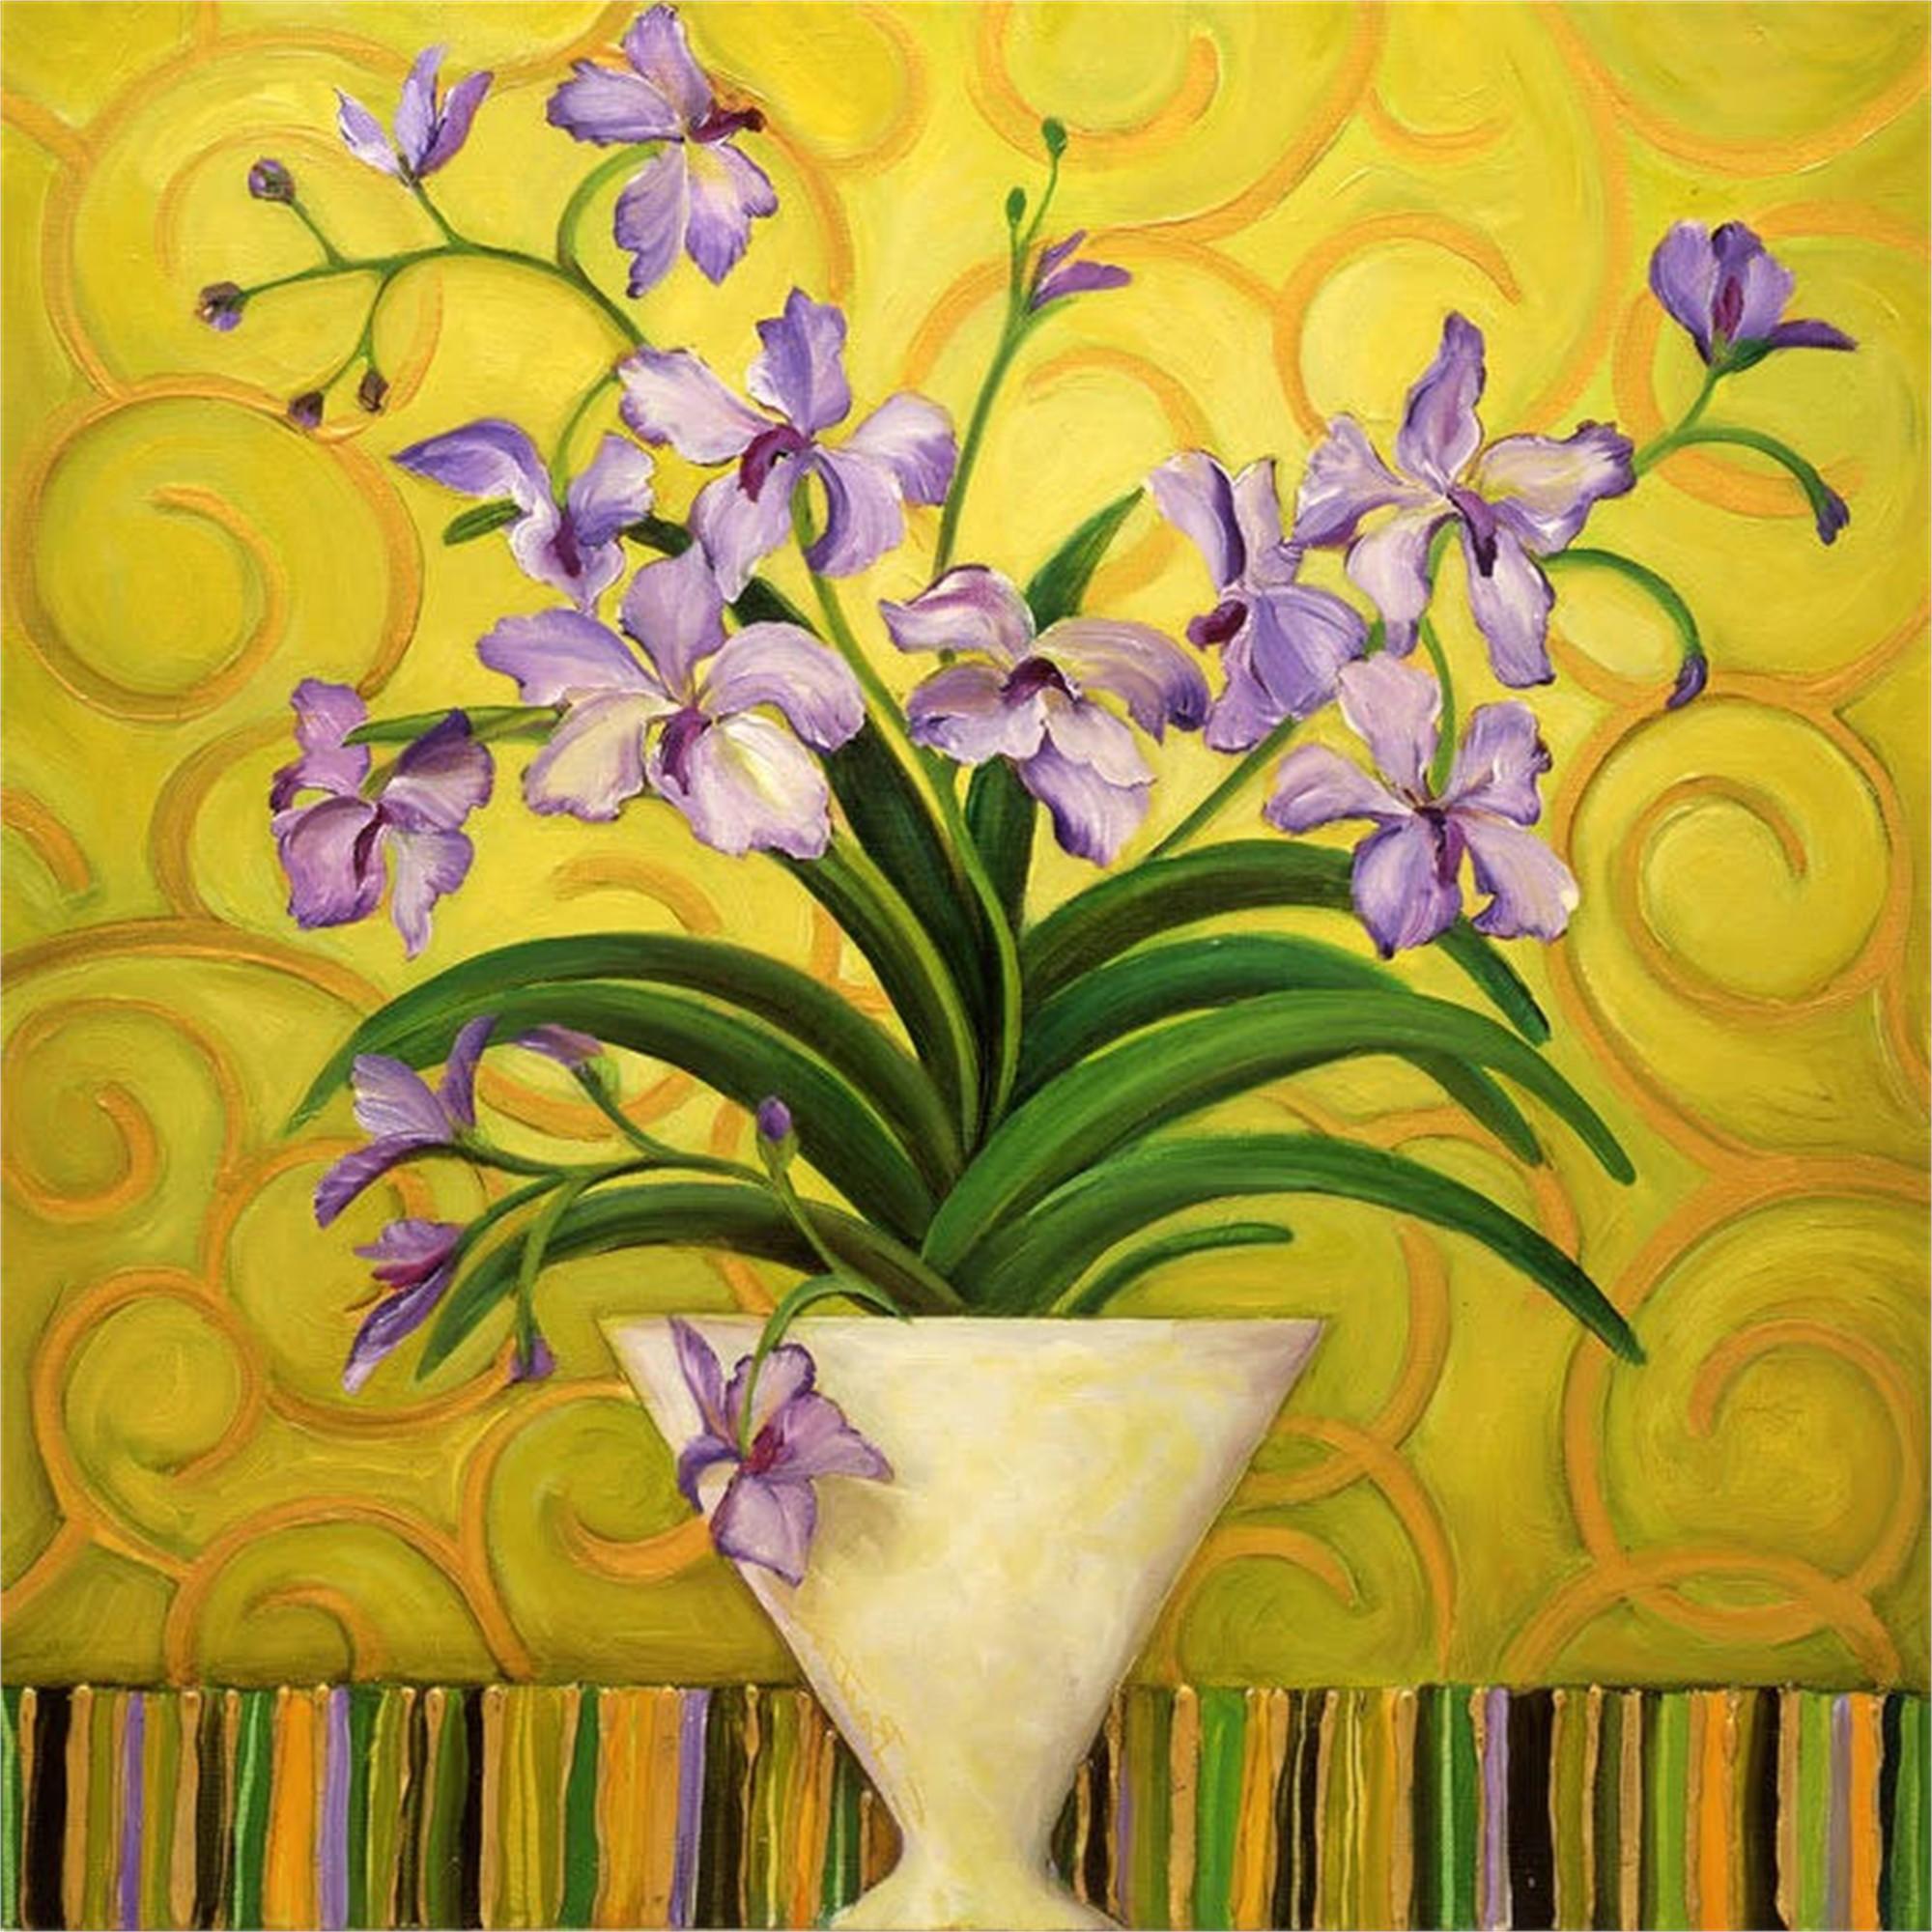 Purple Spring by Shelly Bartek